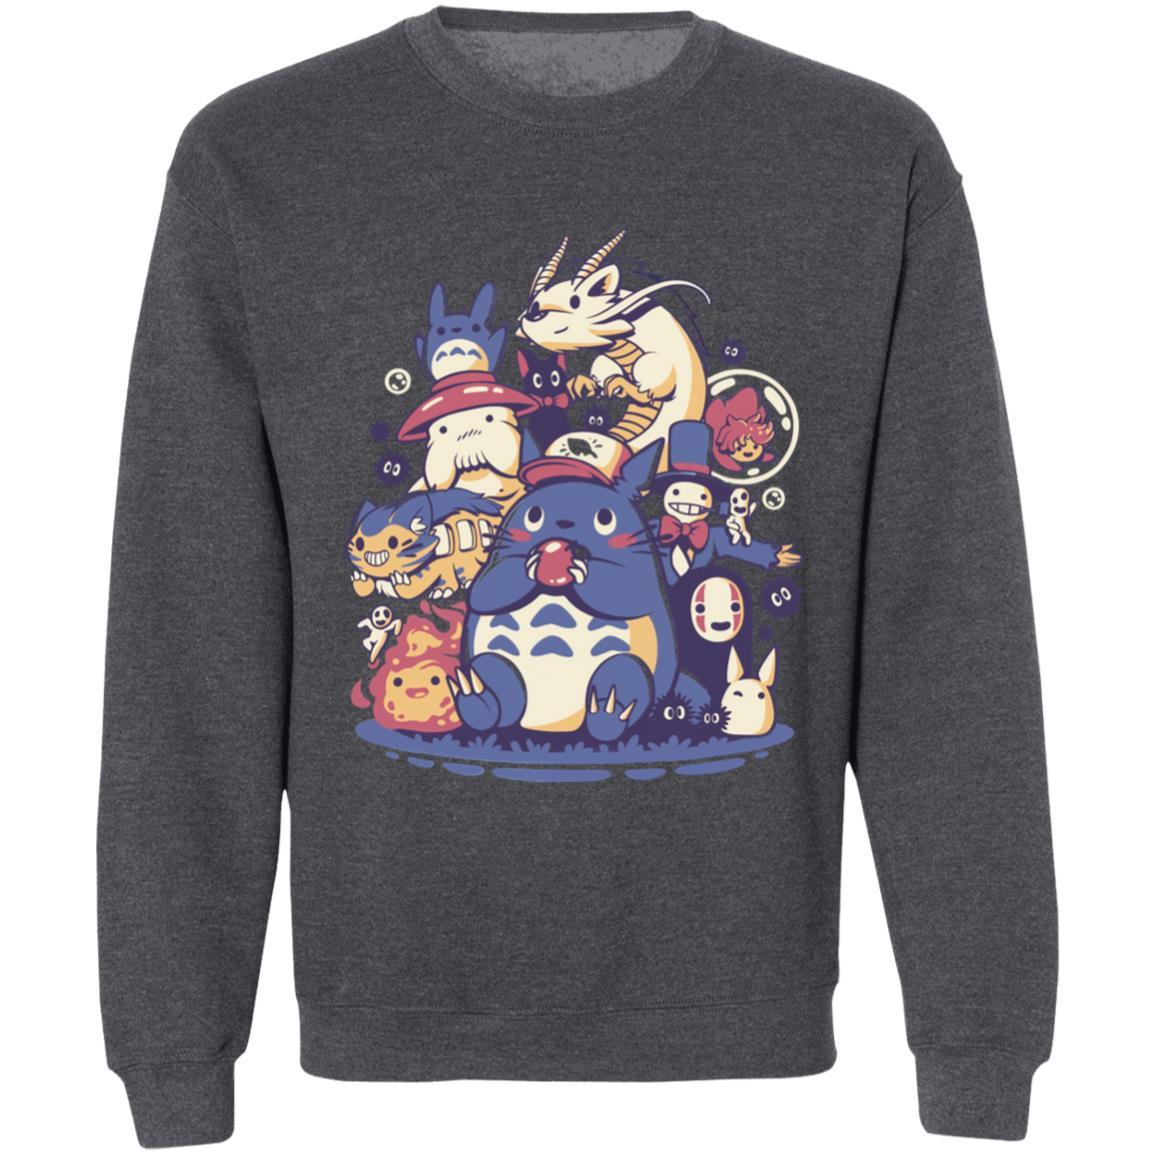 Totoro and Friends Sweatshirt